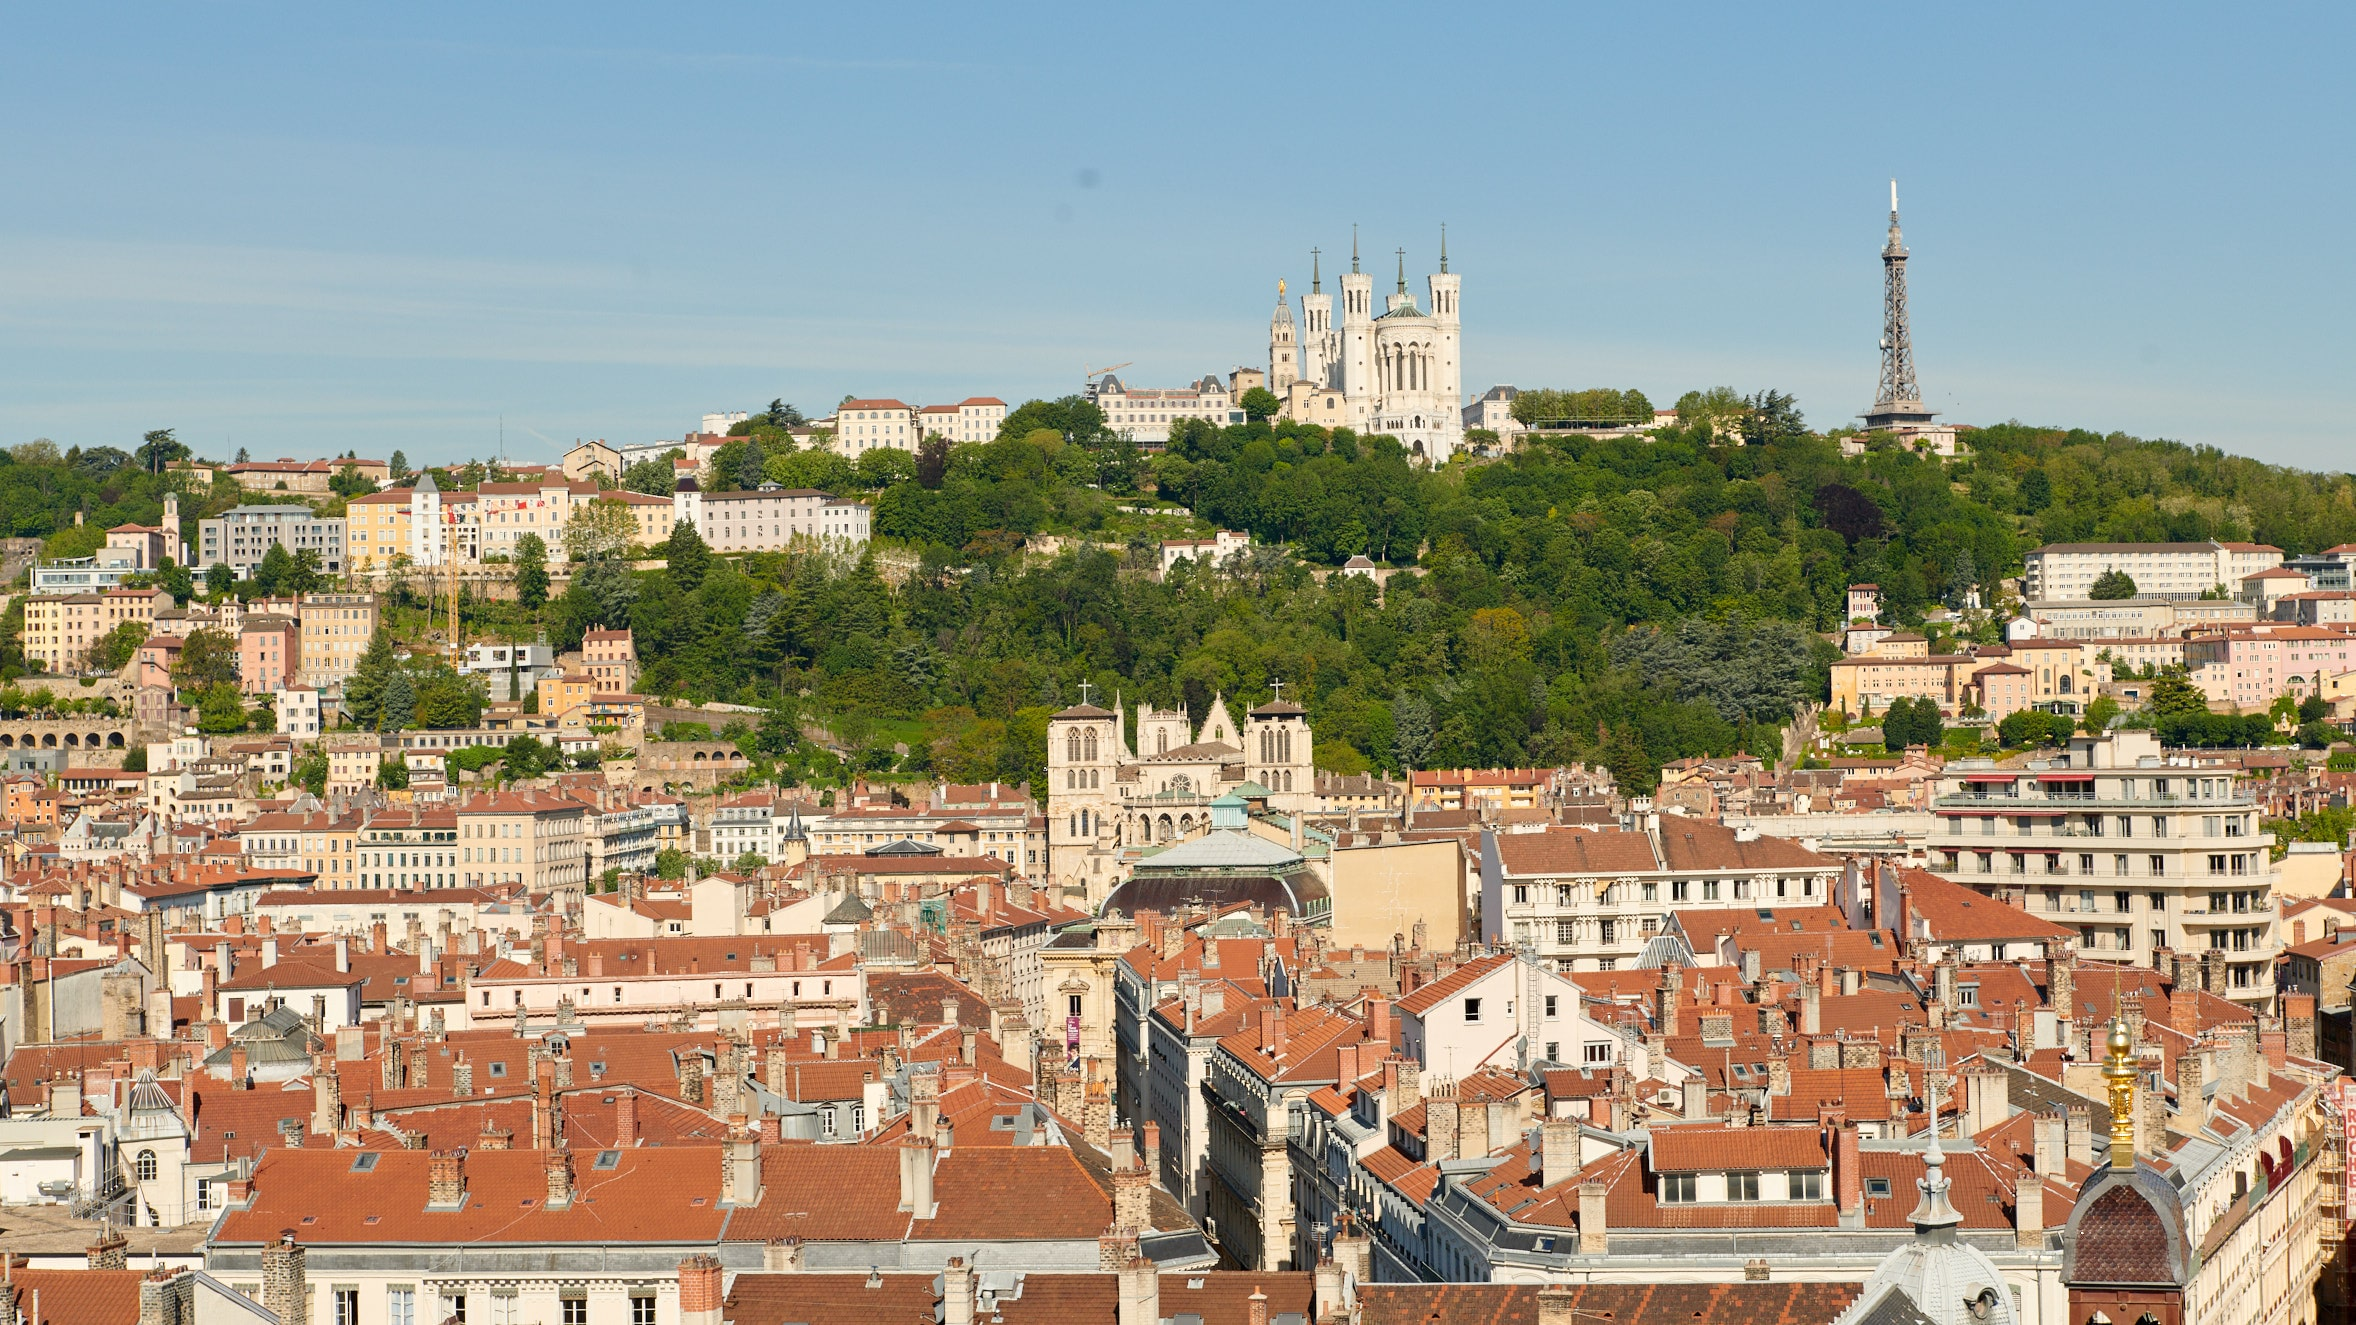 InterContinental Lyon - Hotel Dieu - Hotel de Luxe -vue basilique de fourviere - decouvrir lyon